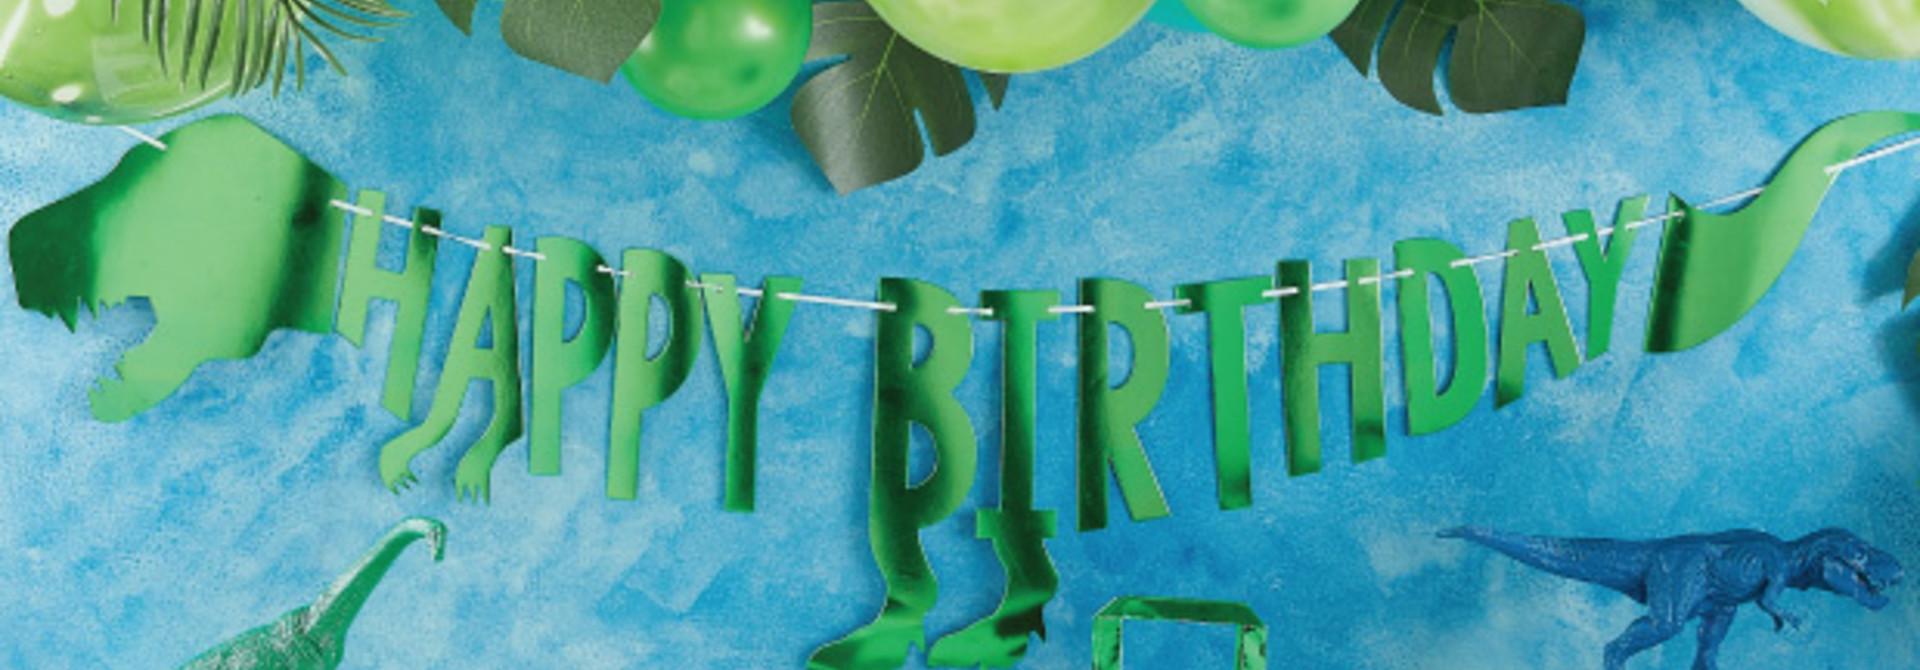 Dinosaurus slinger Happy Birthday Roarsome - Ginger Ray